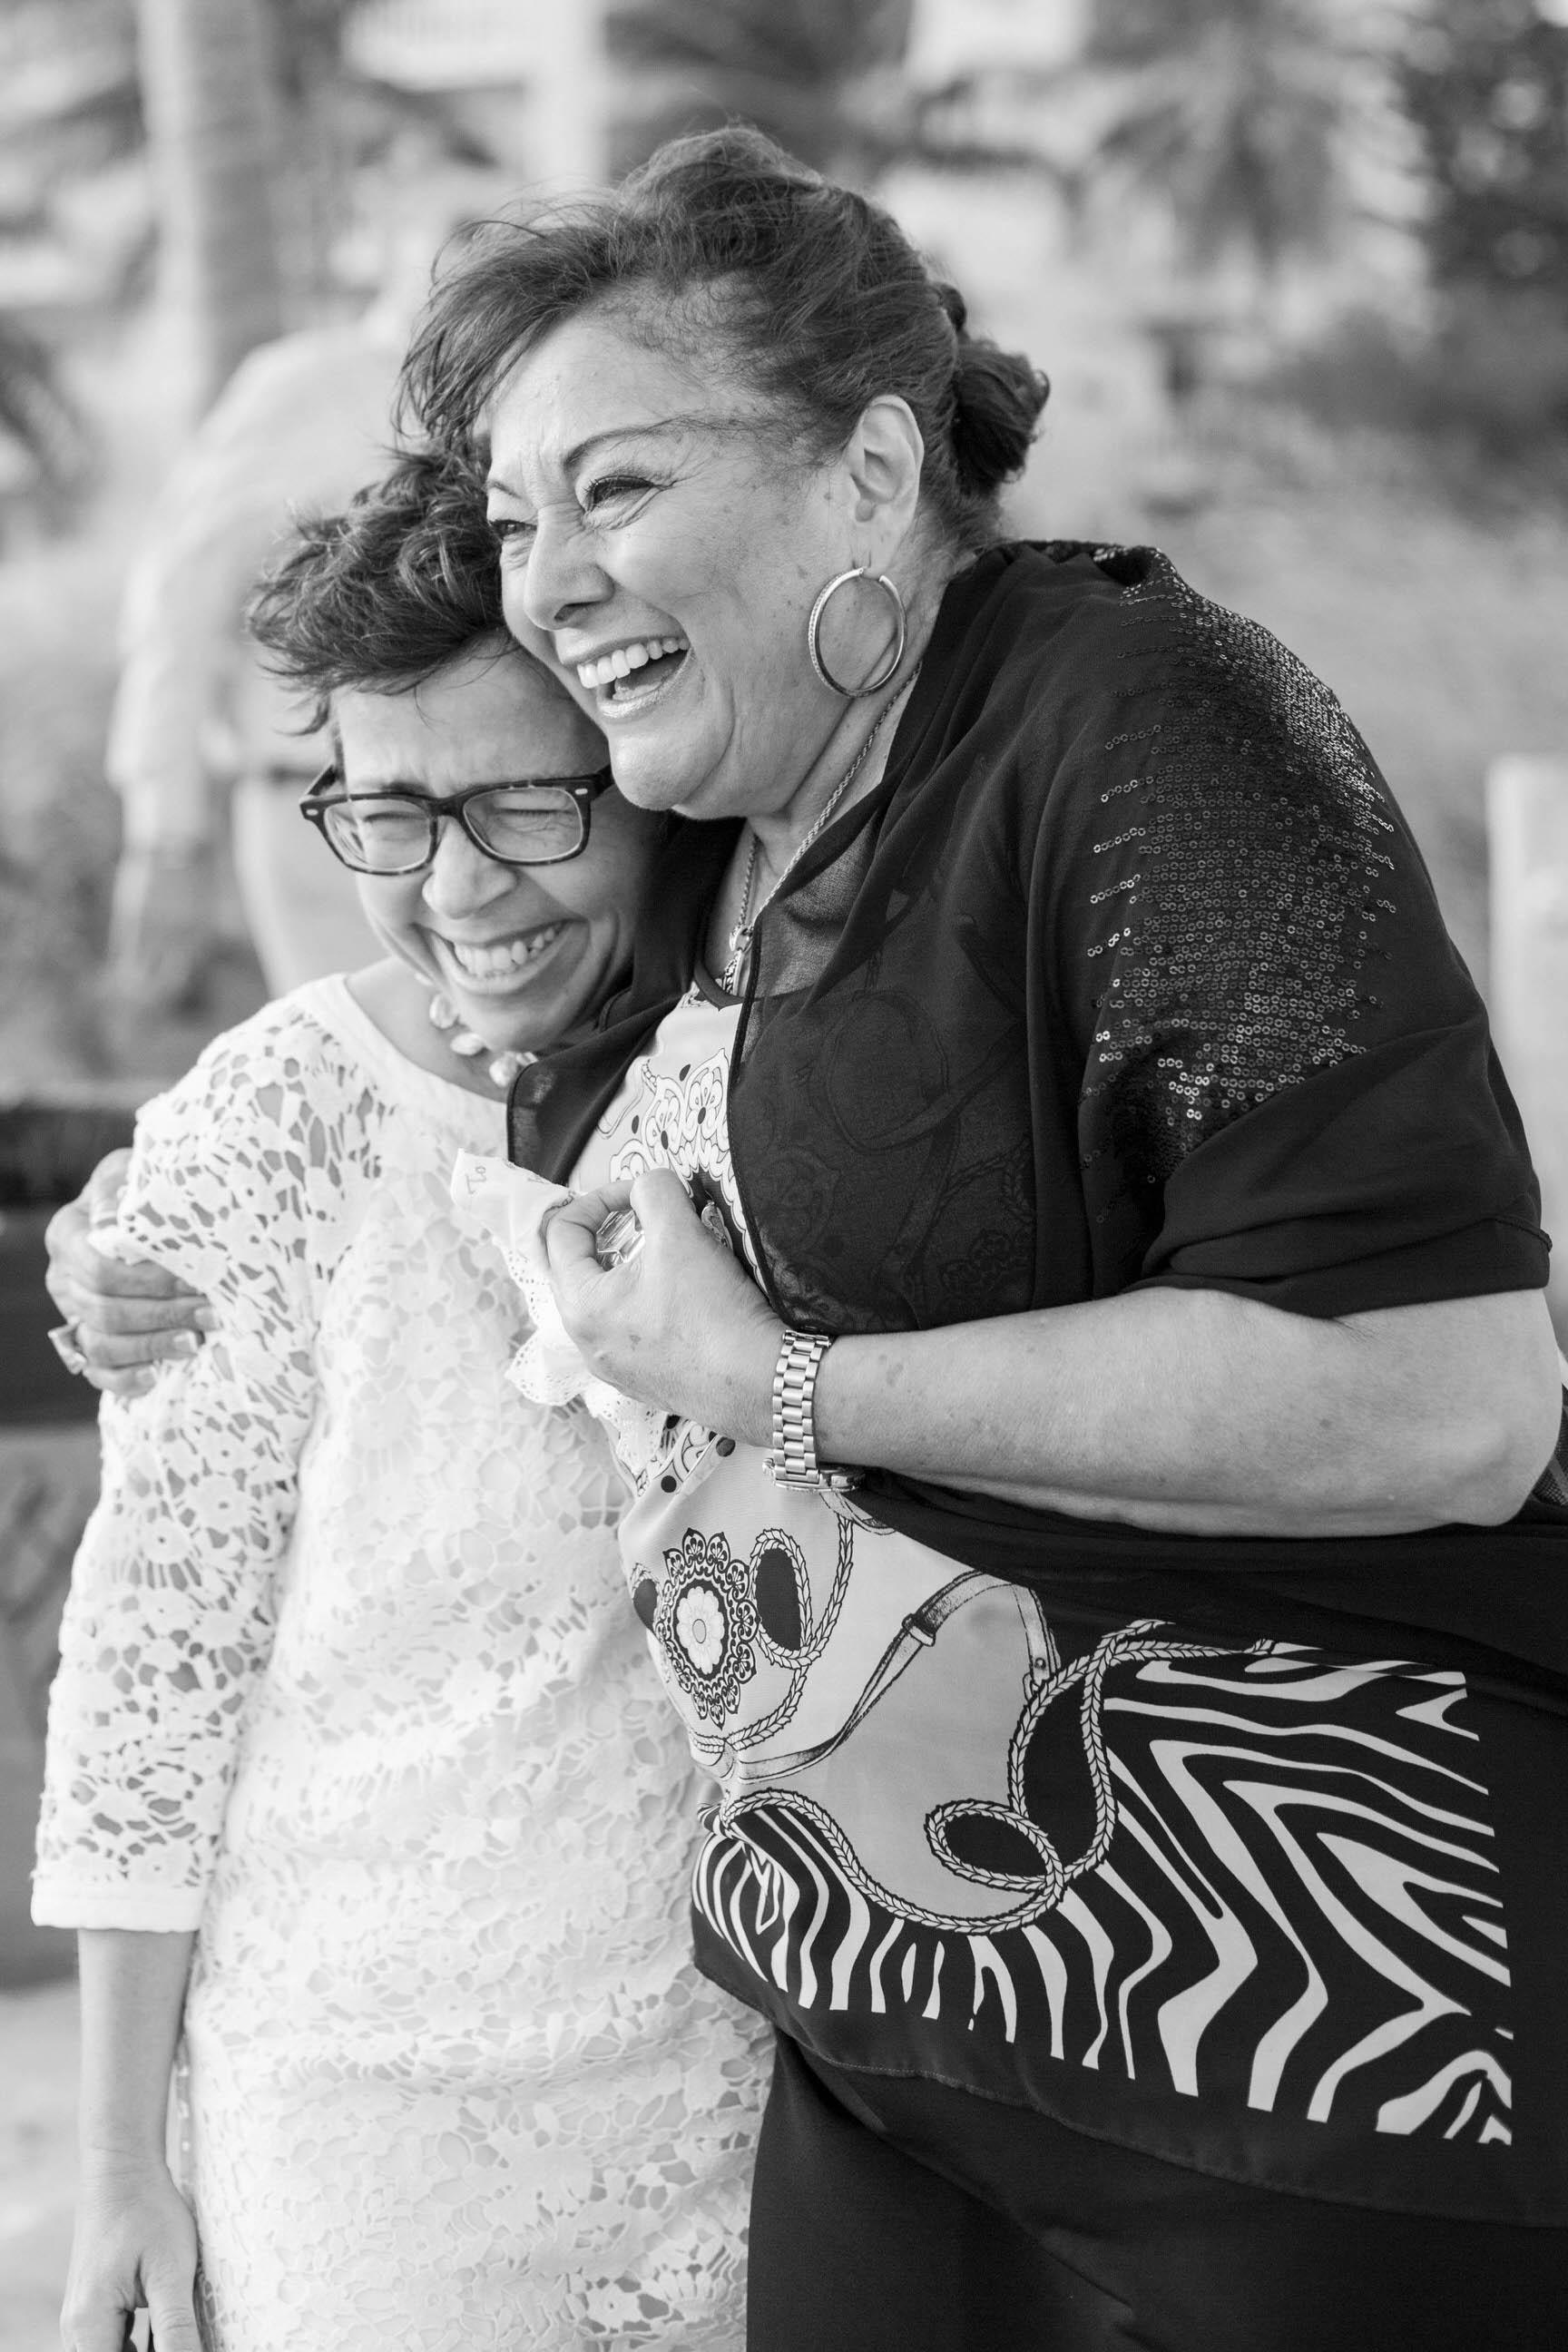 mom_laughing_wedding_emotional_tiny_house_photo.jpg